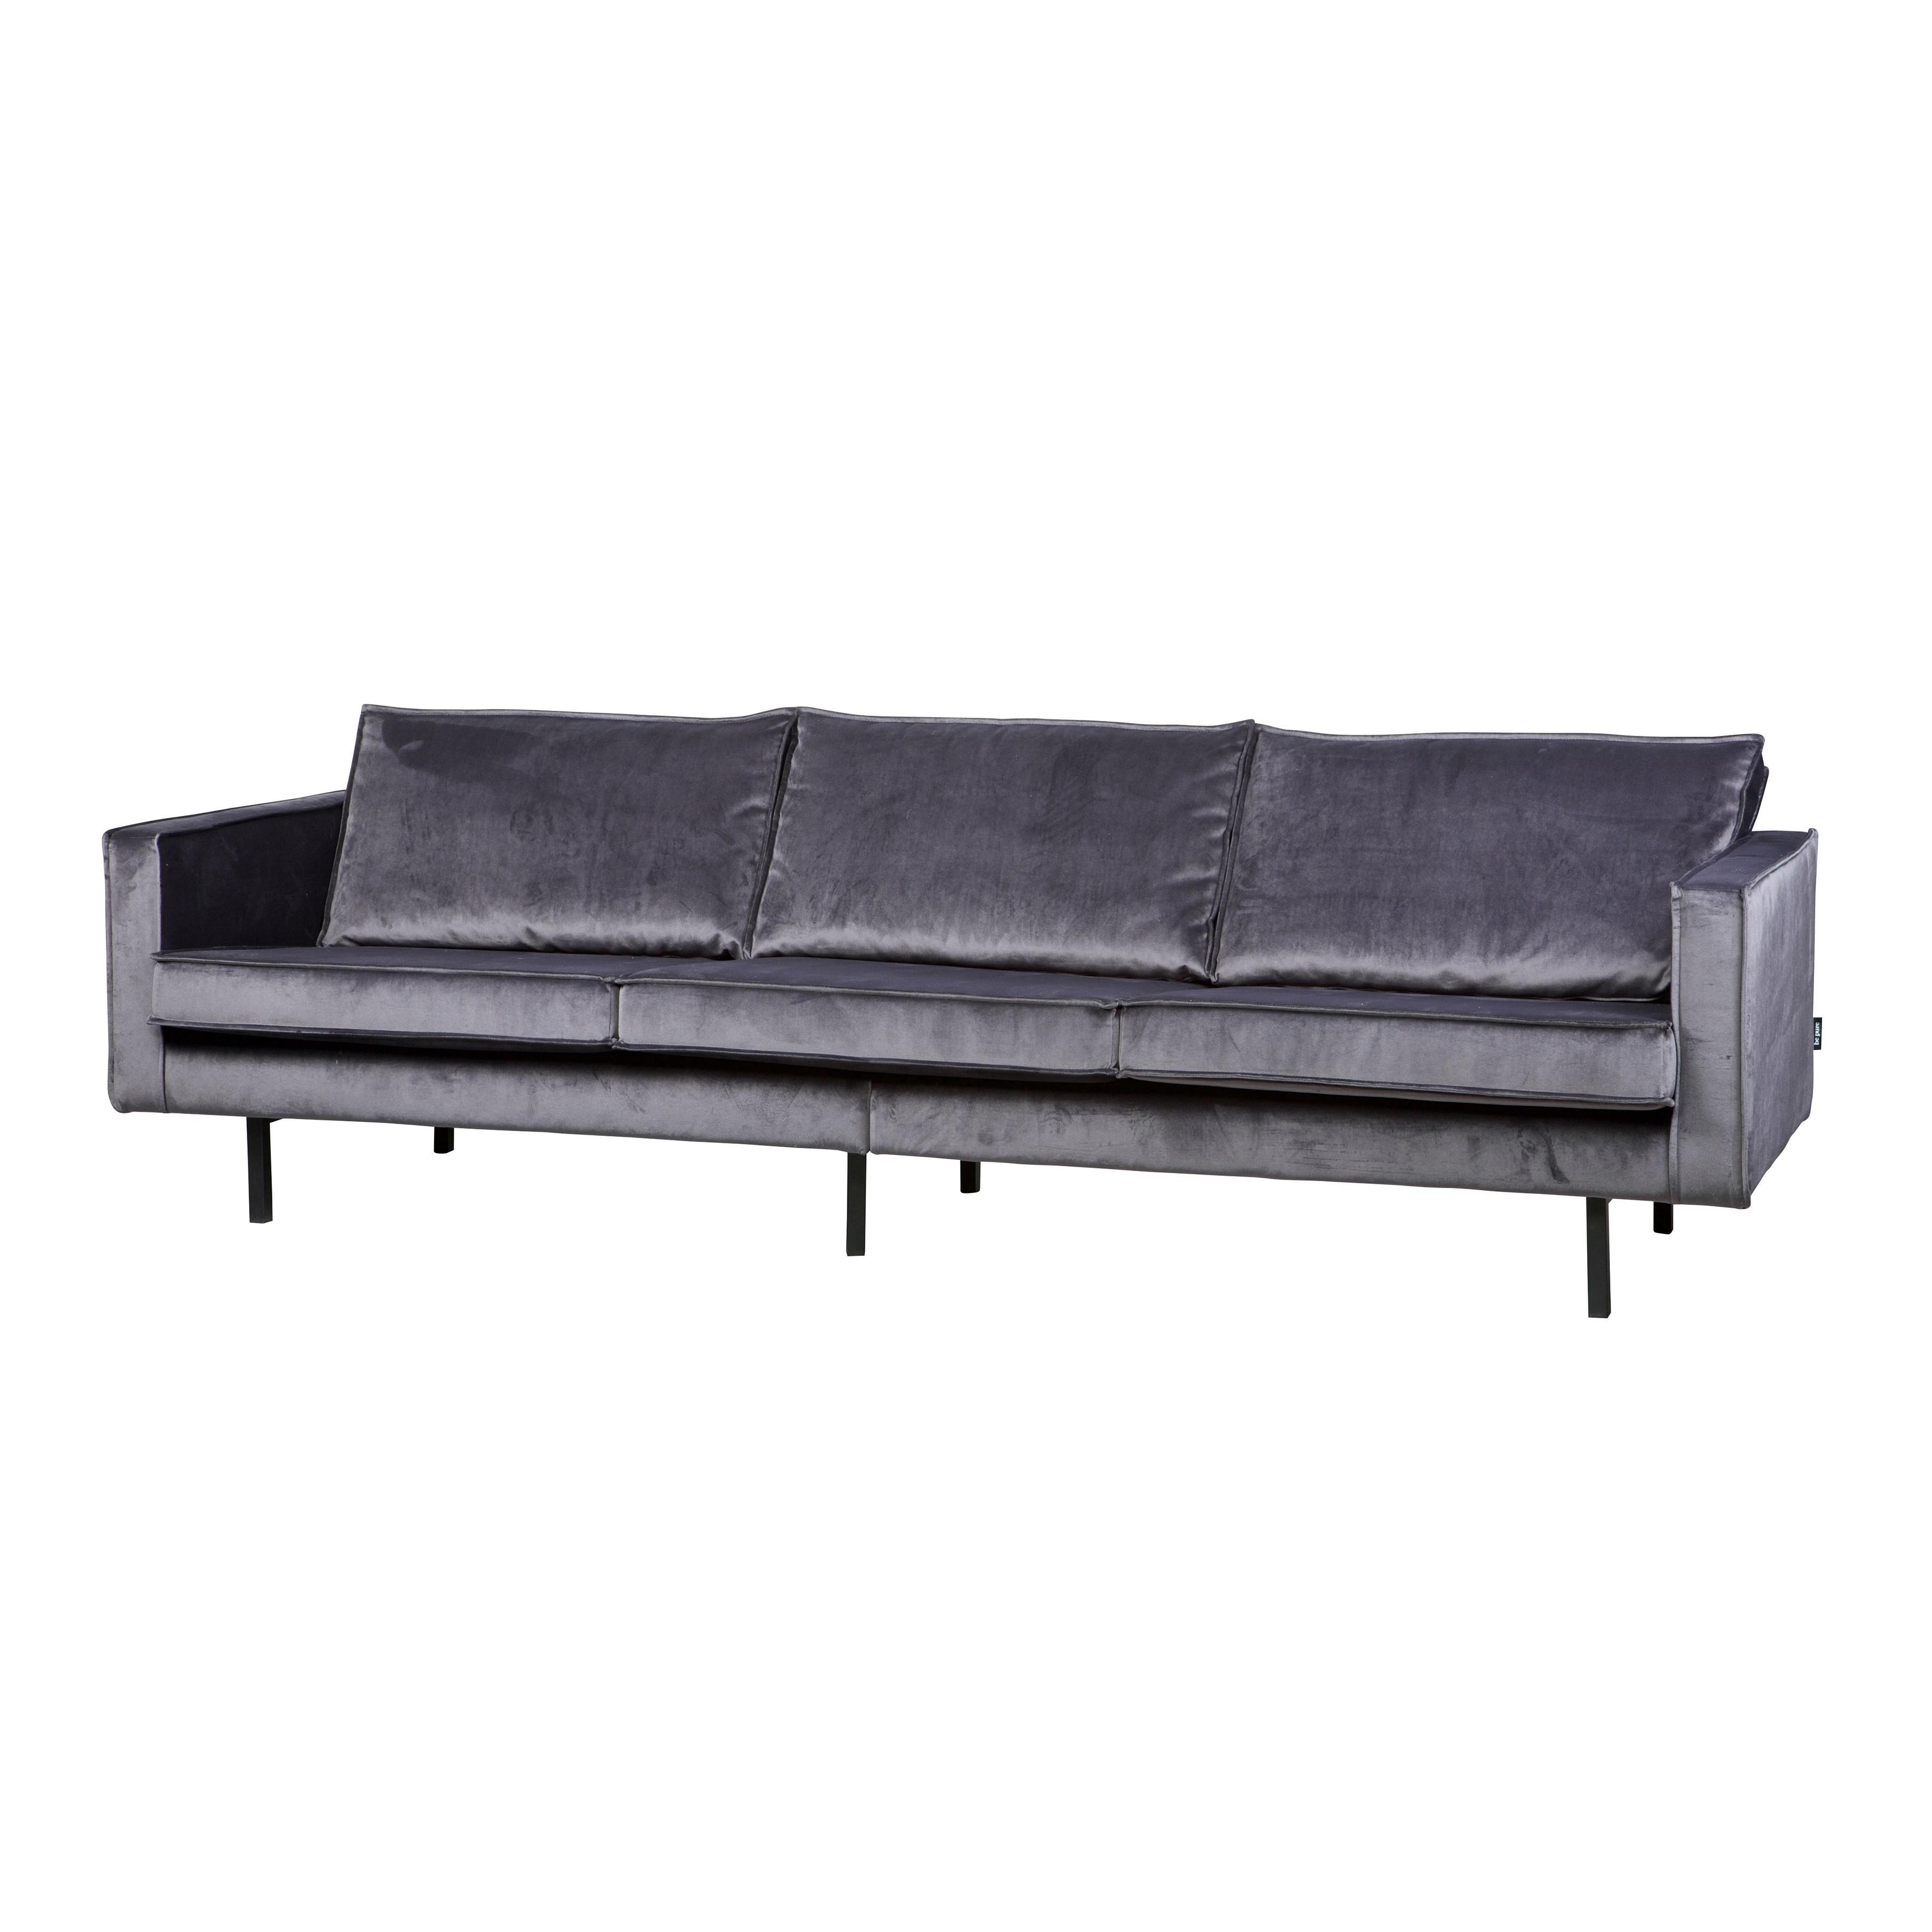 3-Sitzer-Sofa Rodeo Samt | Grau